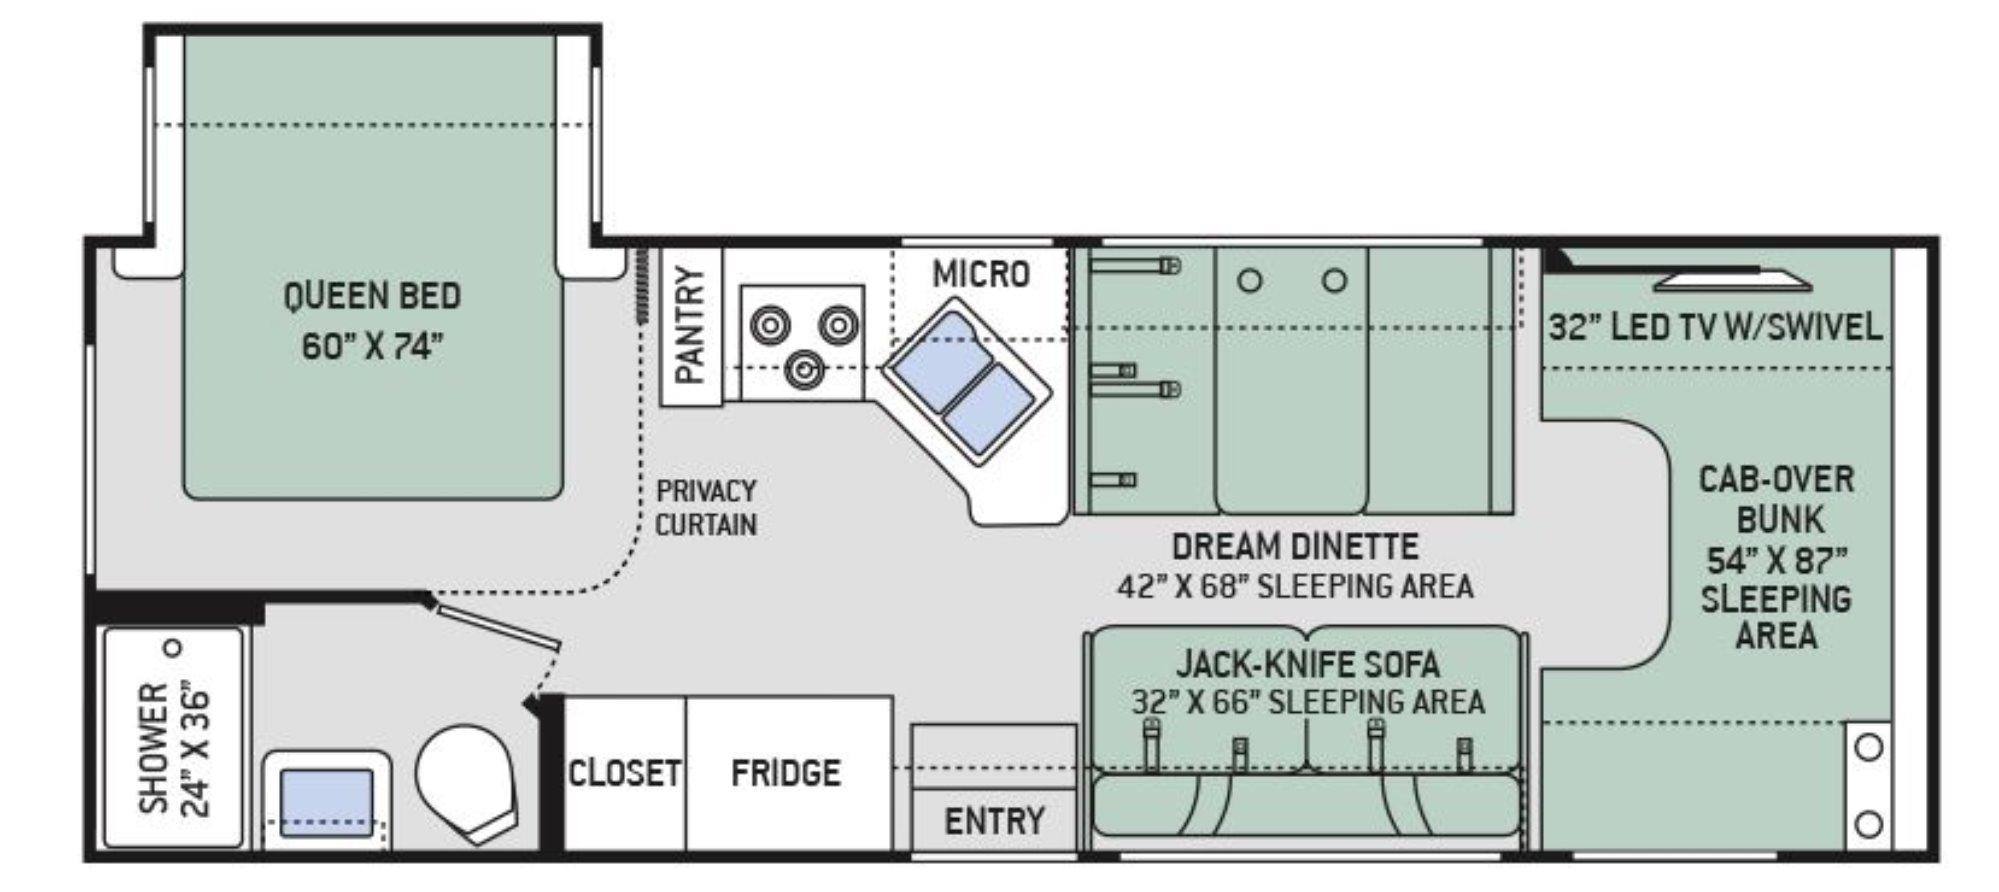 100 prevost floor plans colors prevost country coach for Coach house floor plans